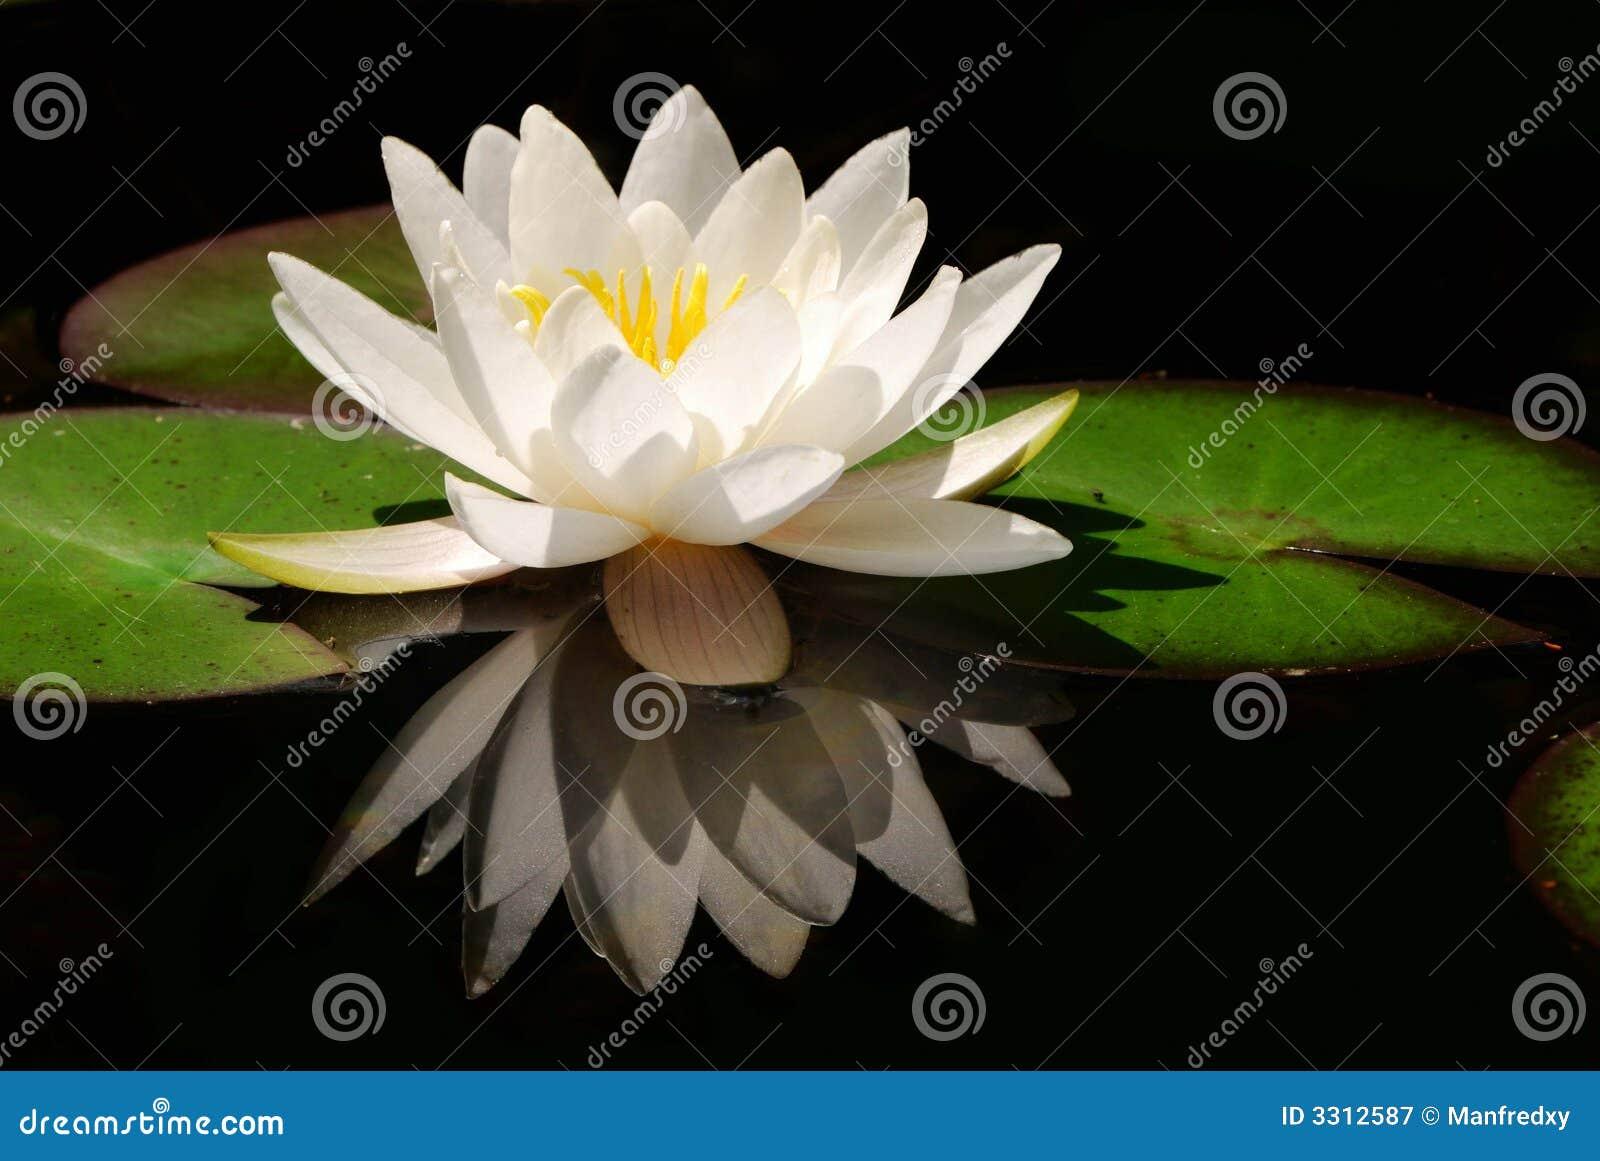 White lotus flower stock image image of floral blossom 3312587 white lotus flower izmirmasajfo